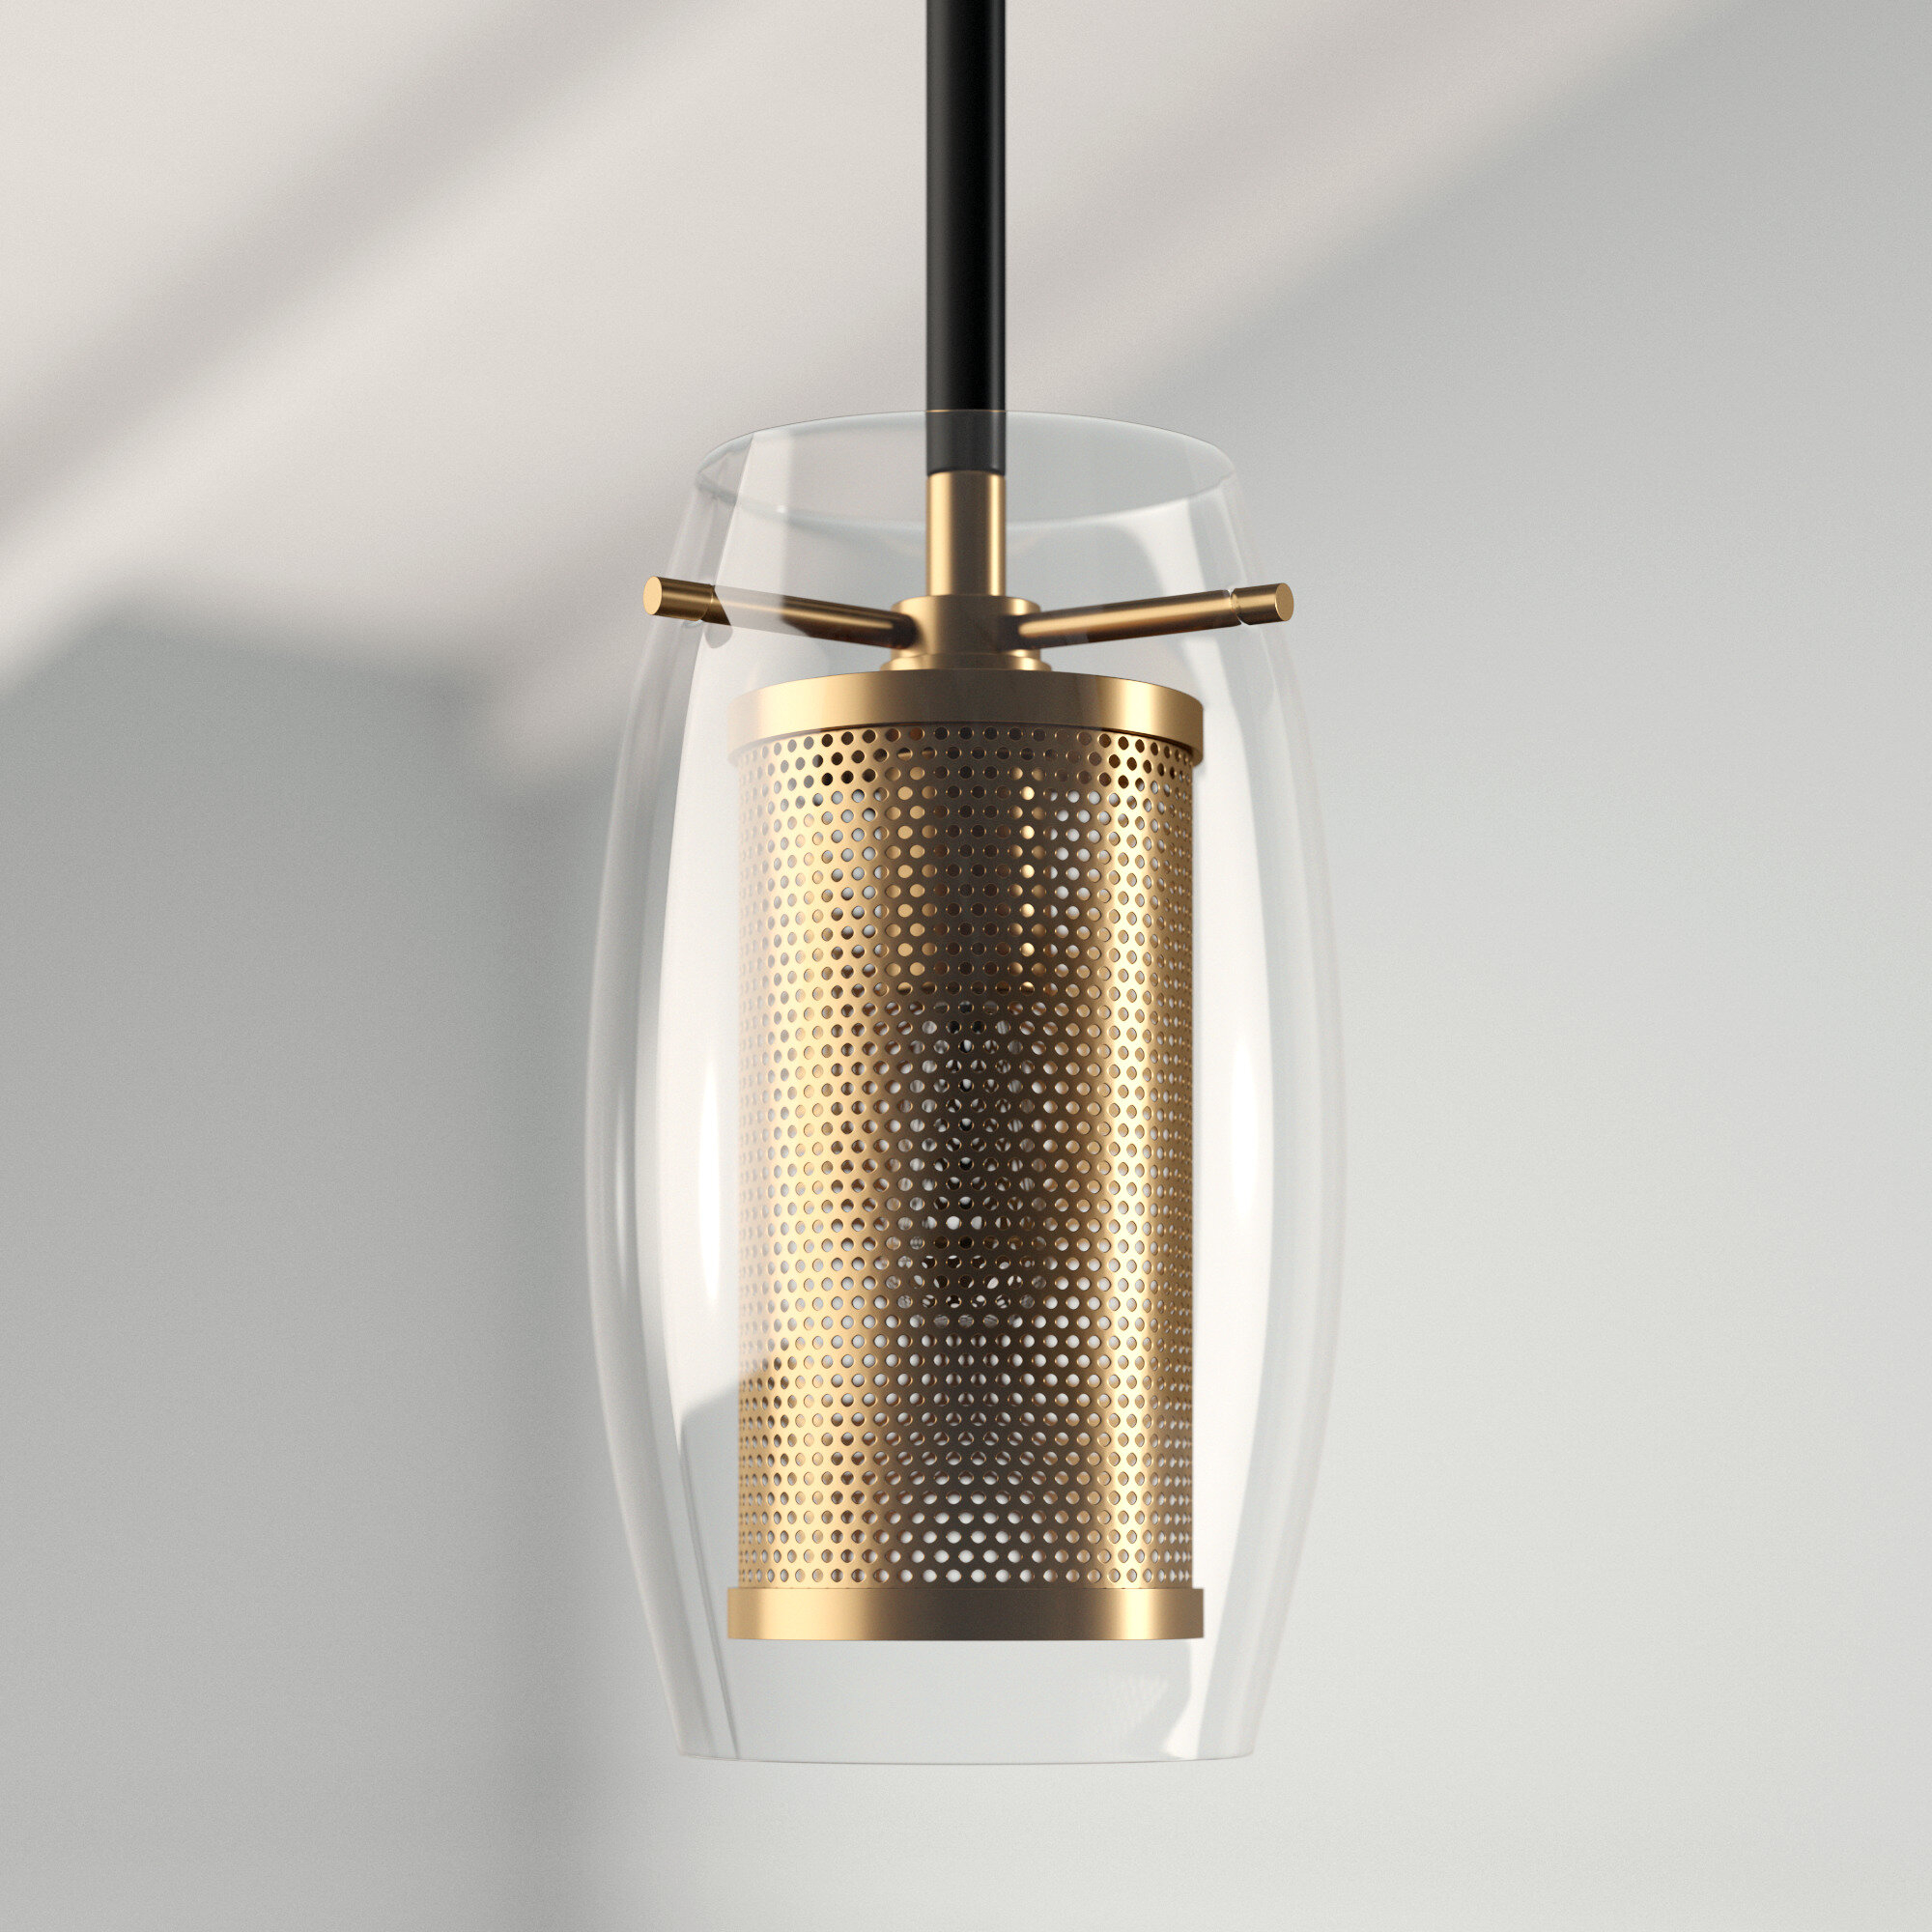 Depp 1 Light Single Cylinder Pendant With Regard To Fennia 1 Light Single Cylinder Pendants (Photo 7 of 30)